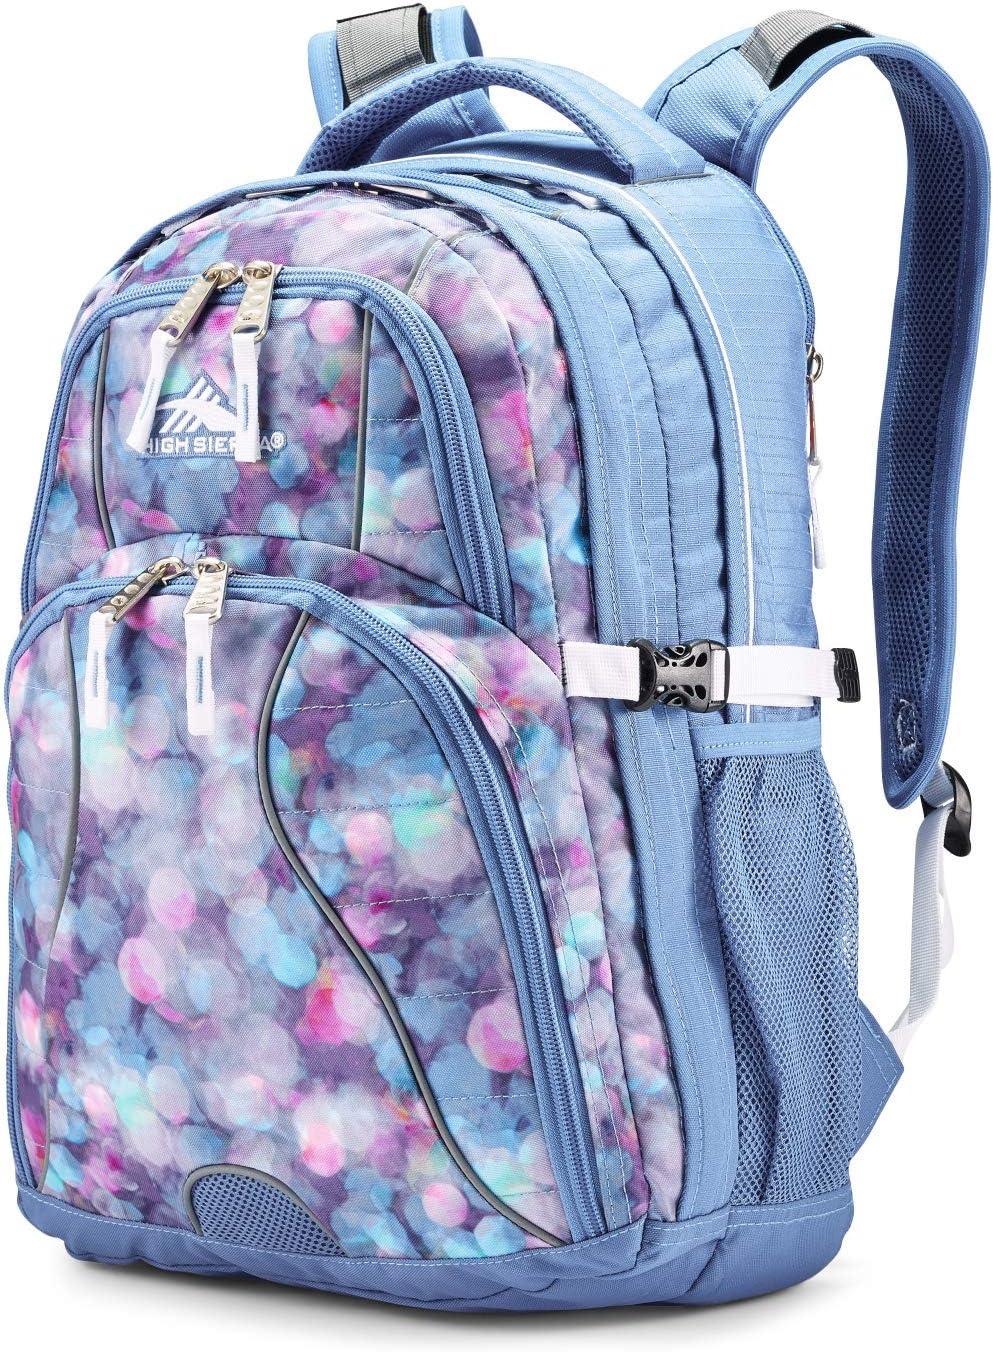 High Sierra Swerve Laptop Backpack